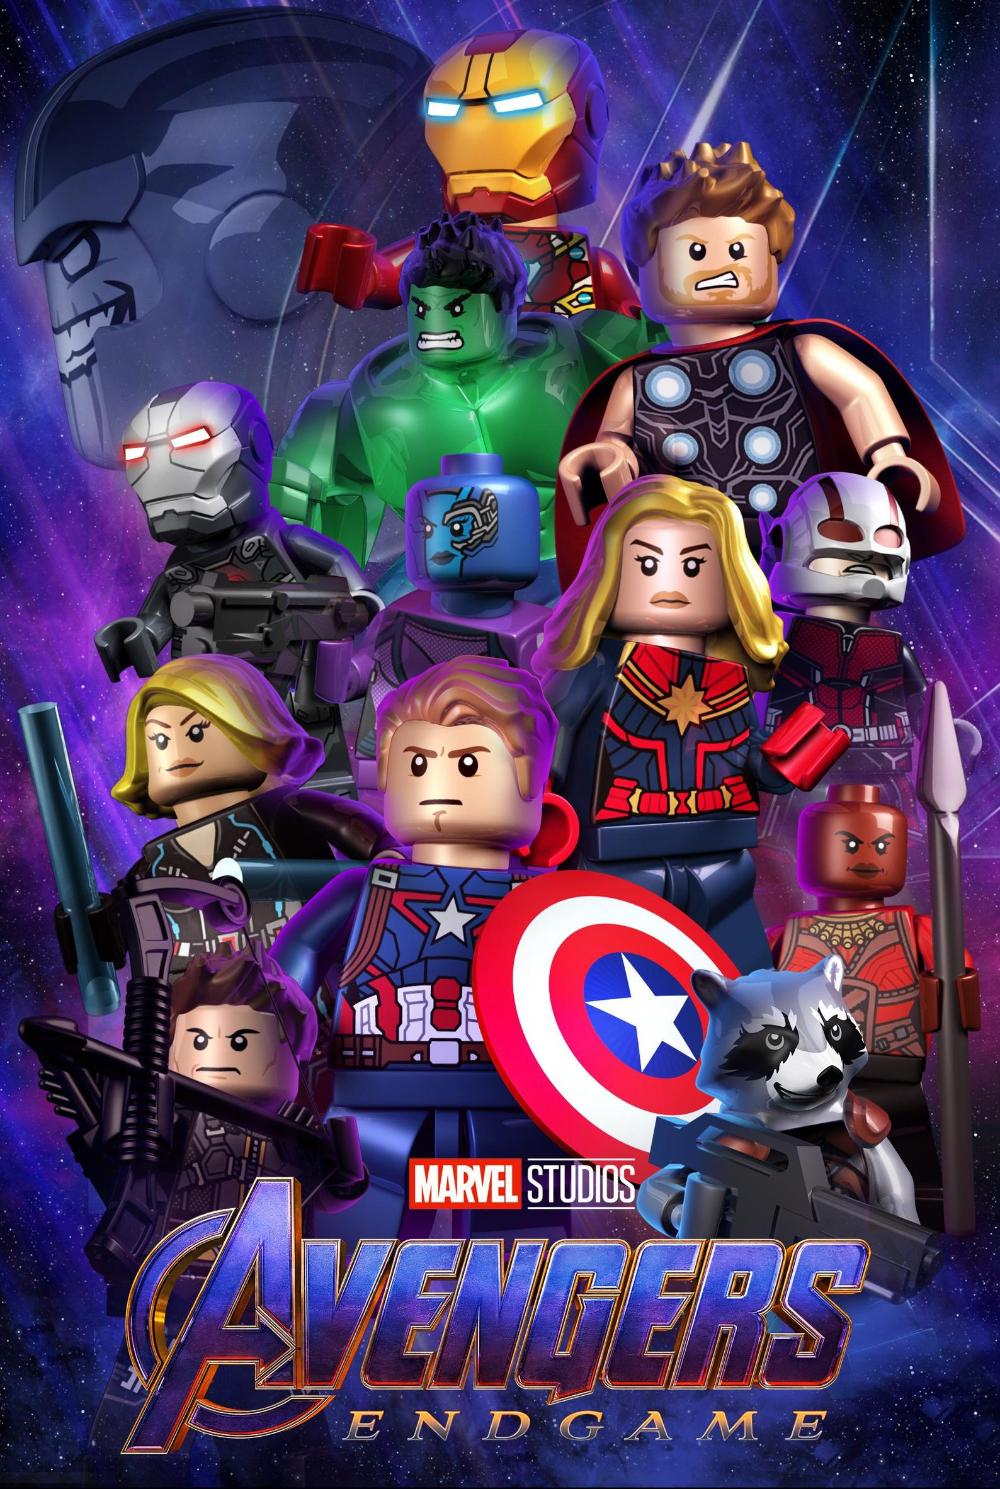 Lego Avengers Edgame Poster Etsy Lego Iron Man Lego Poster Avengers Poster